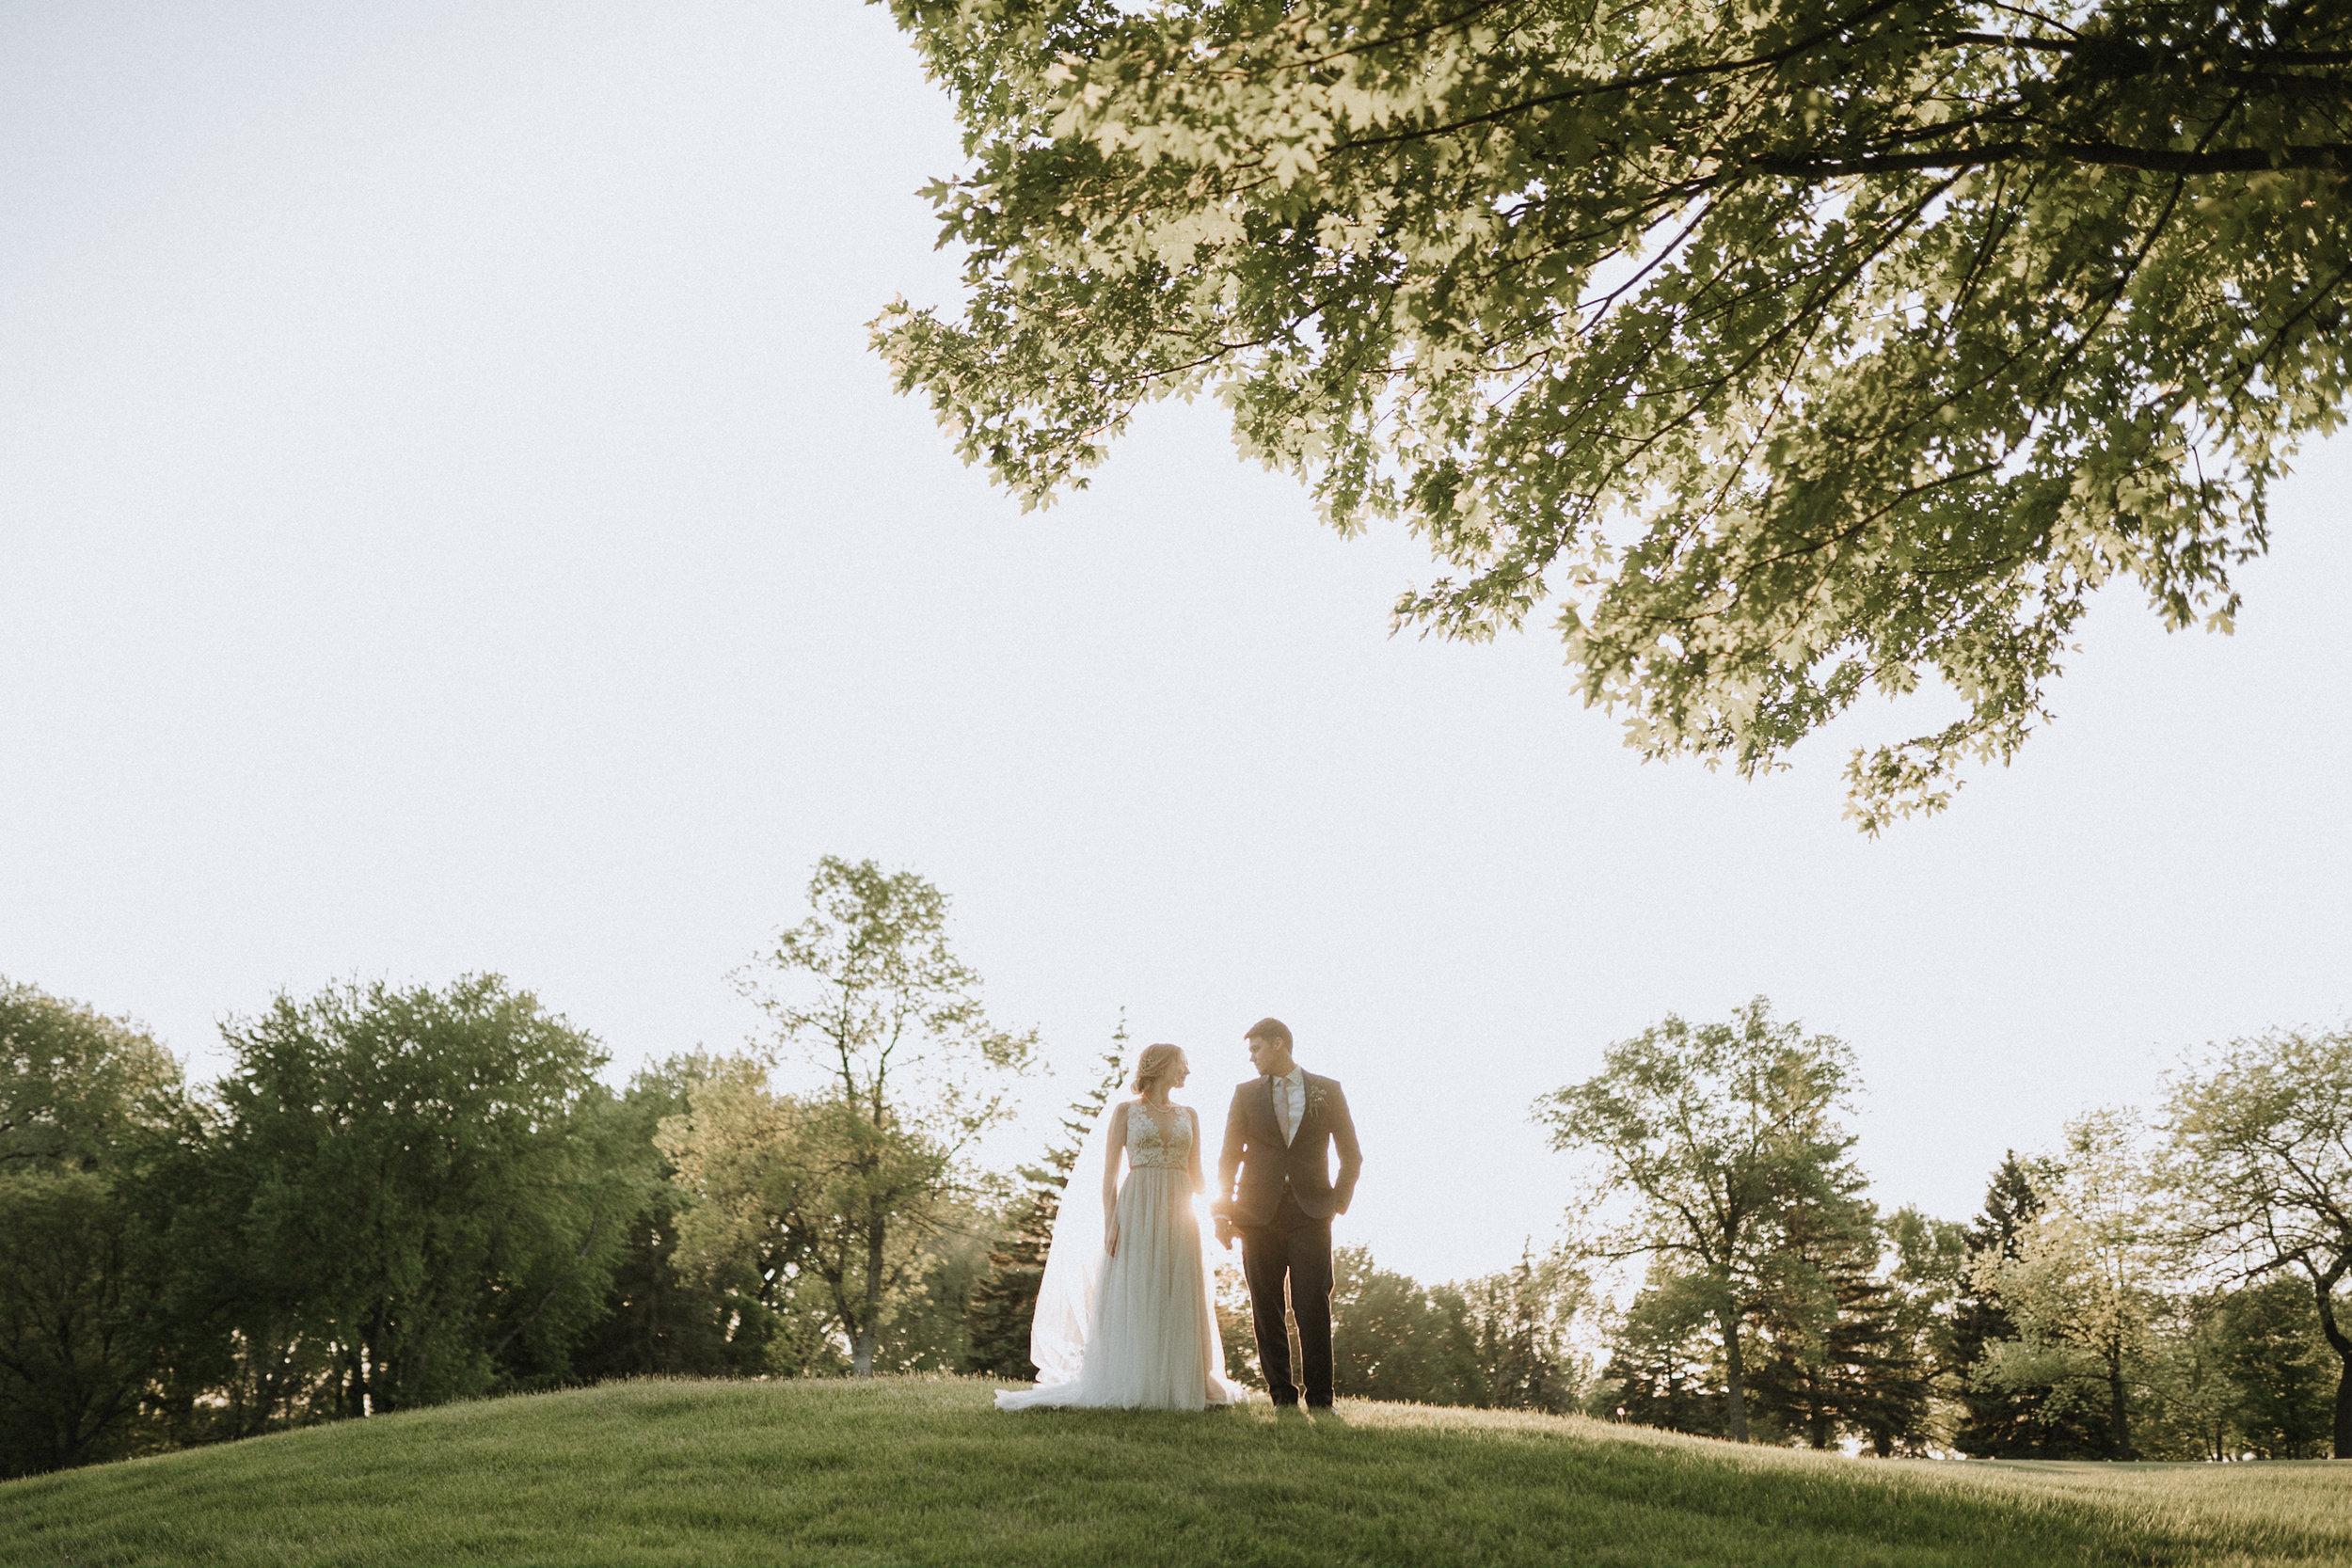 Wedding_(8_of_10).jpg